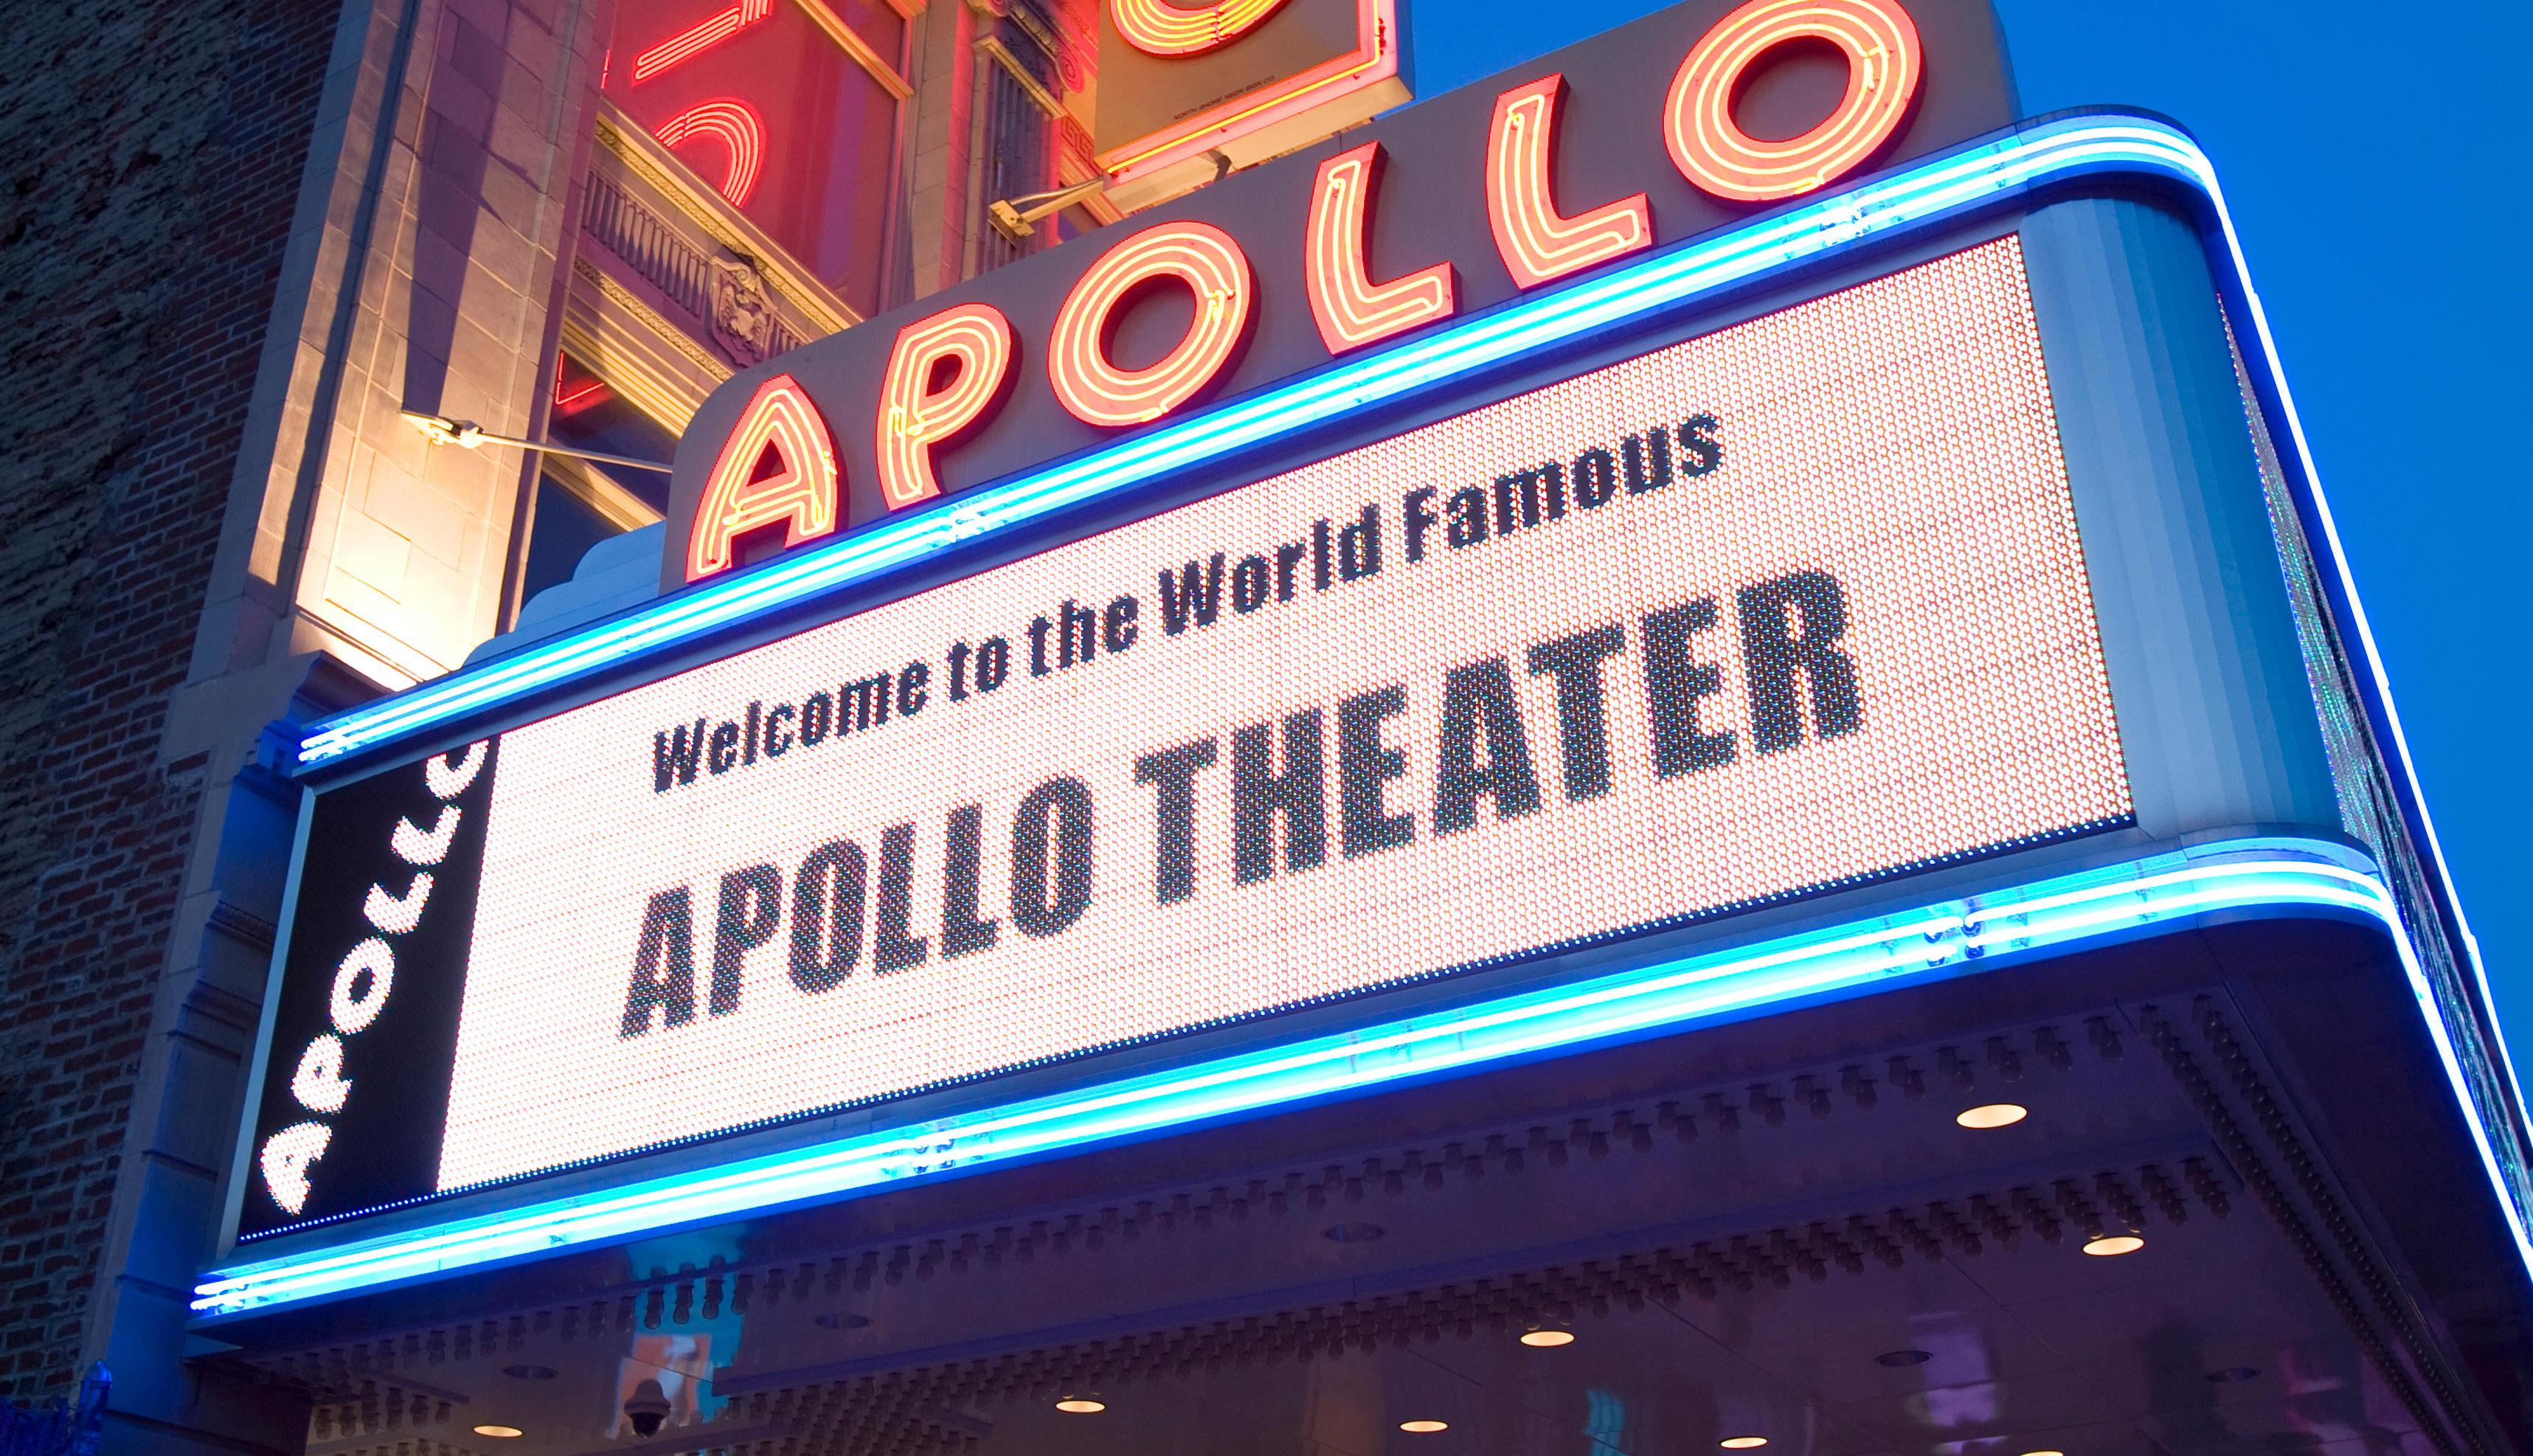 Apollo Theater, en Harlem, Manhattan, Nueva York.